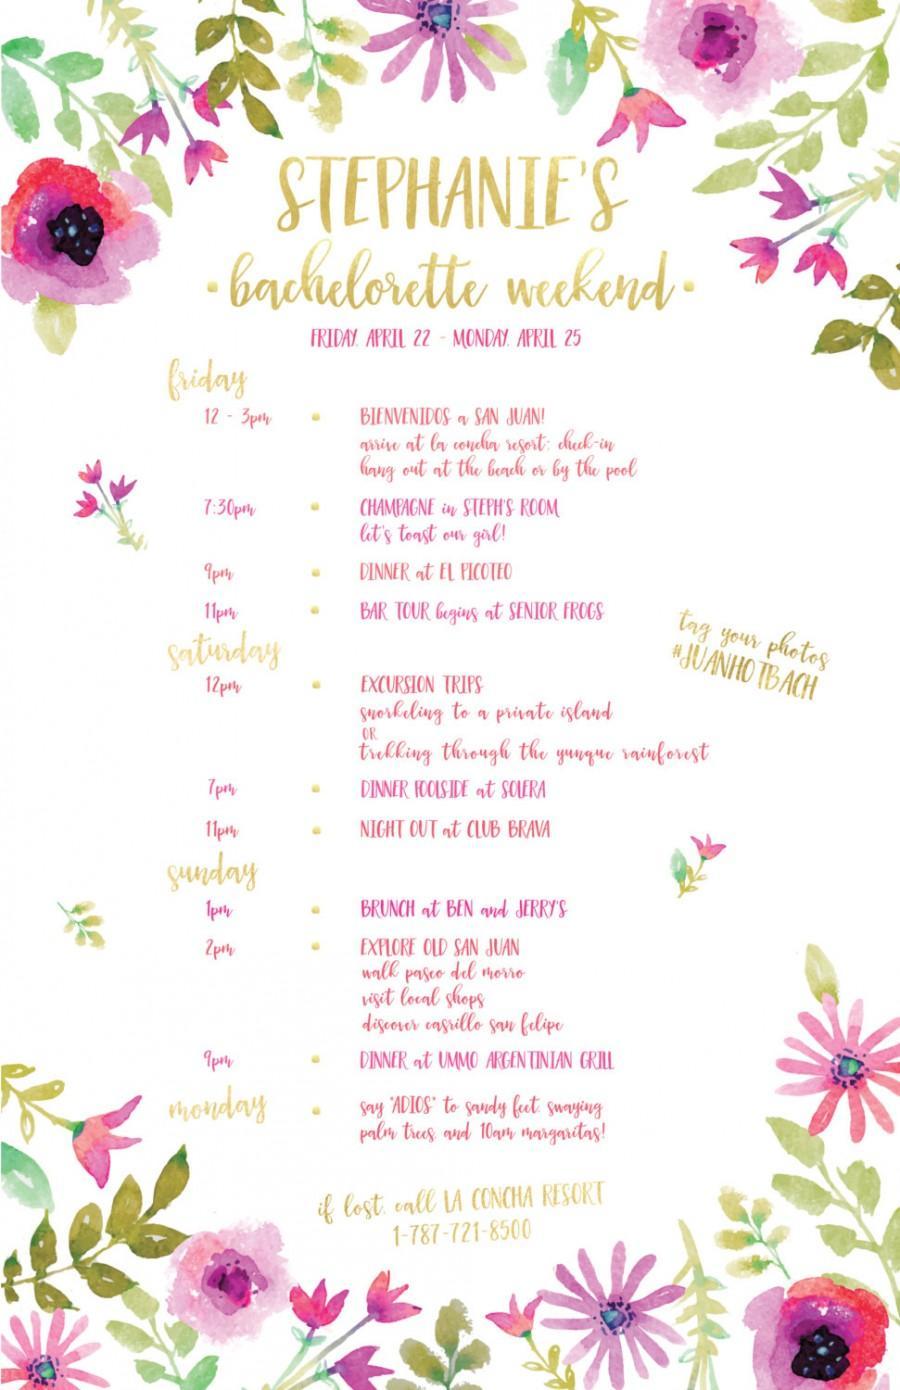 Düğün - Pink Watercolor Flower and Gold Foil Art Bachelorette Itinerary